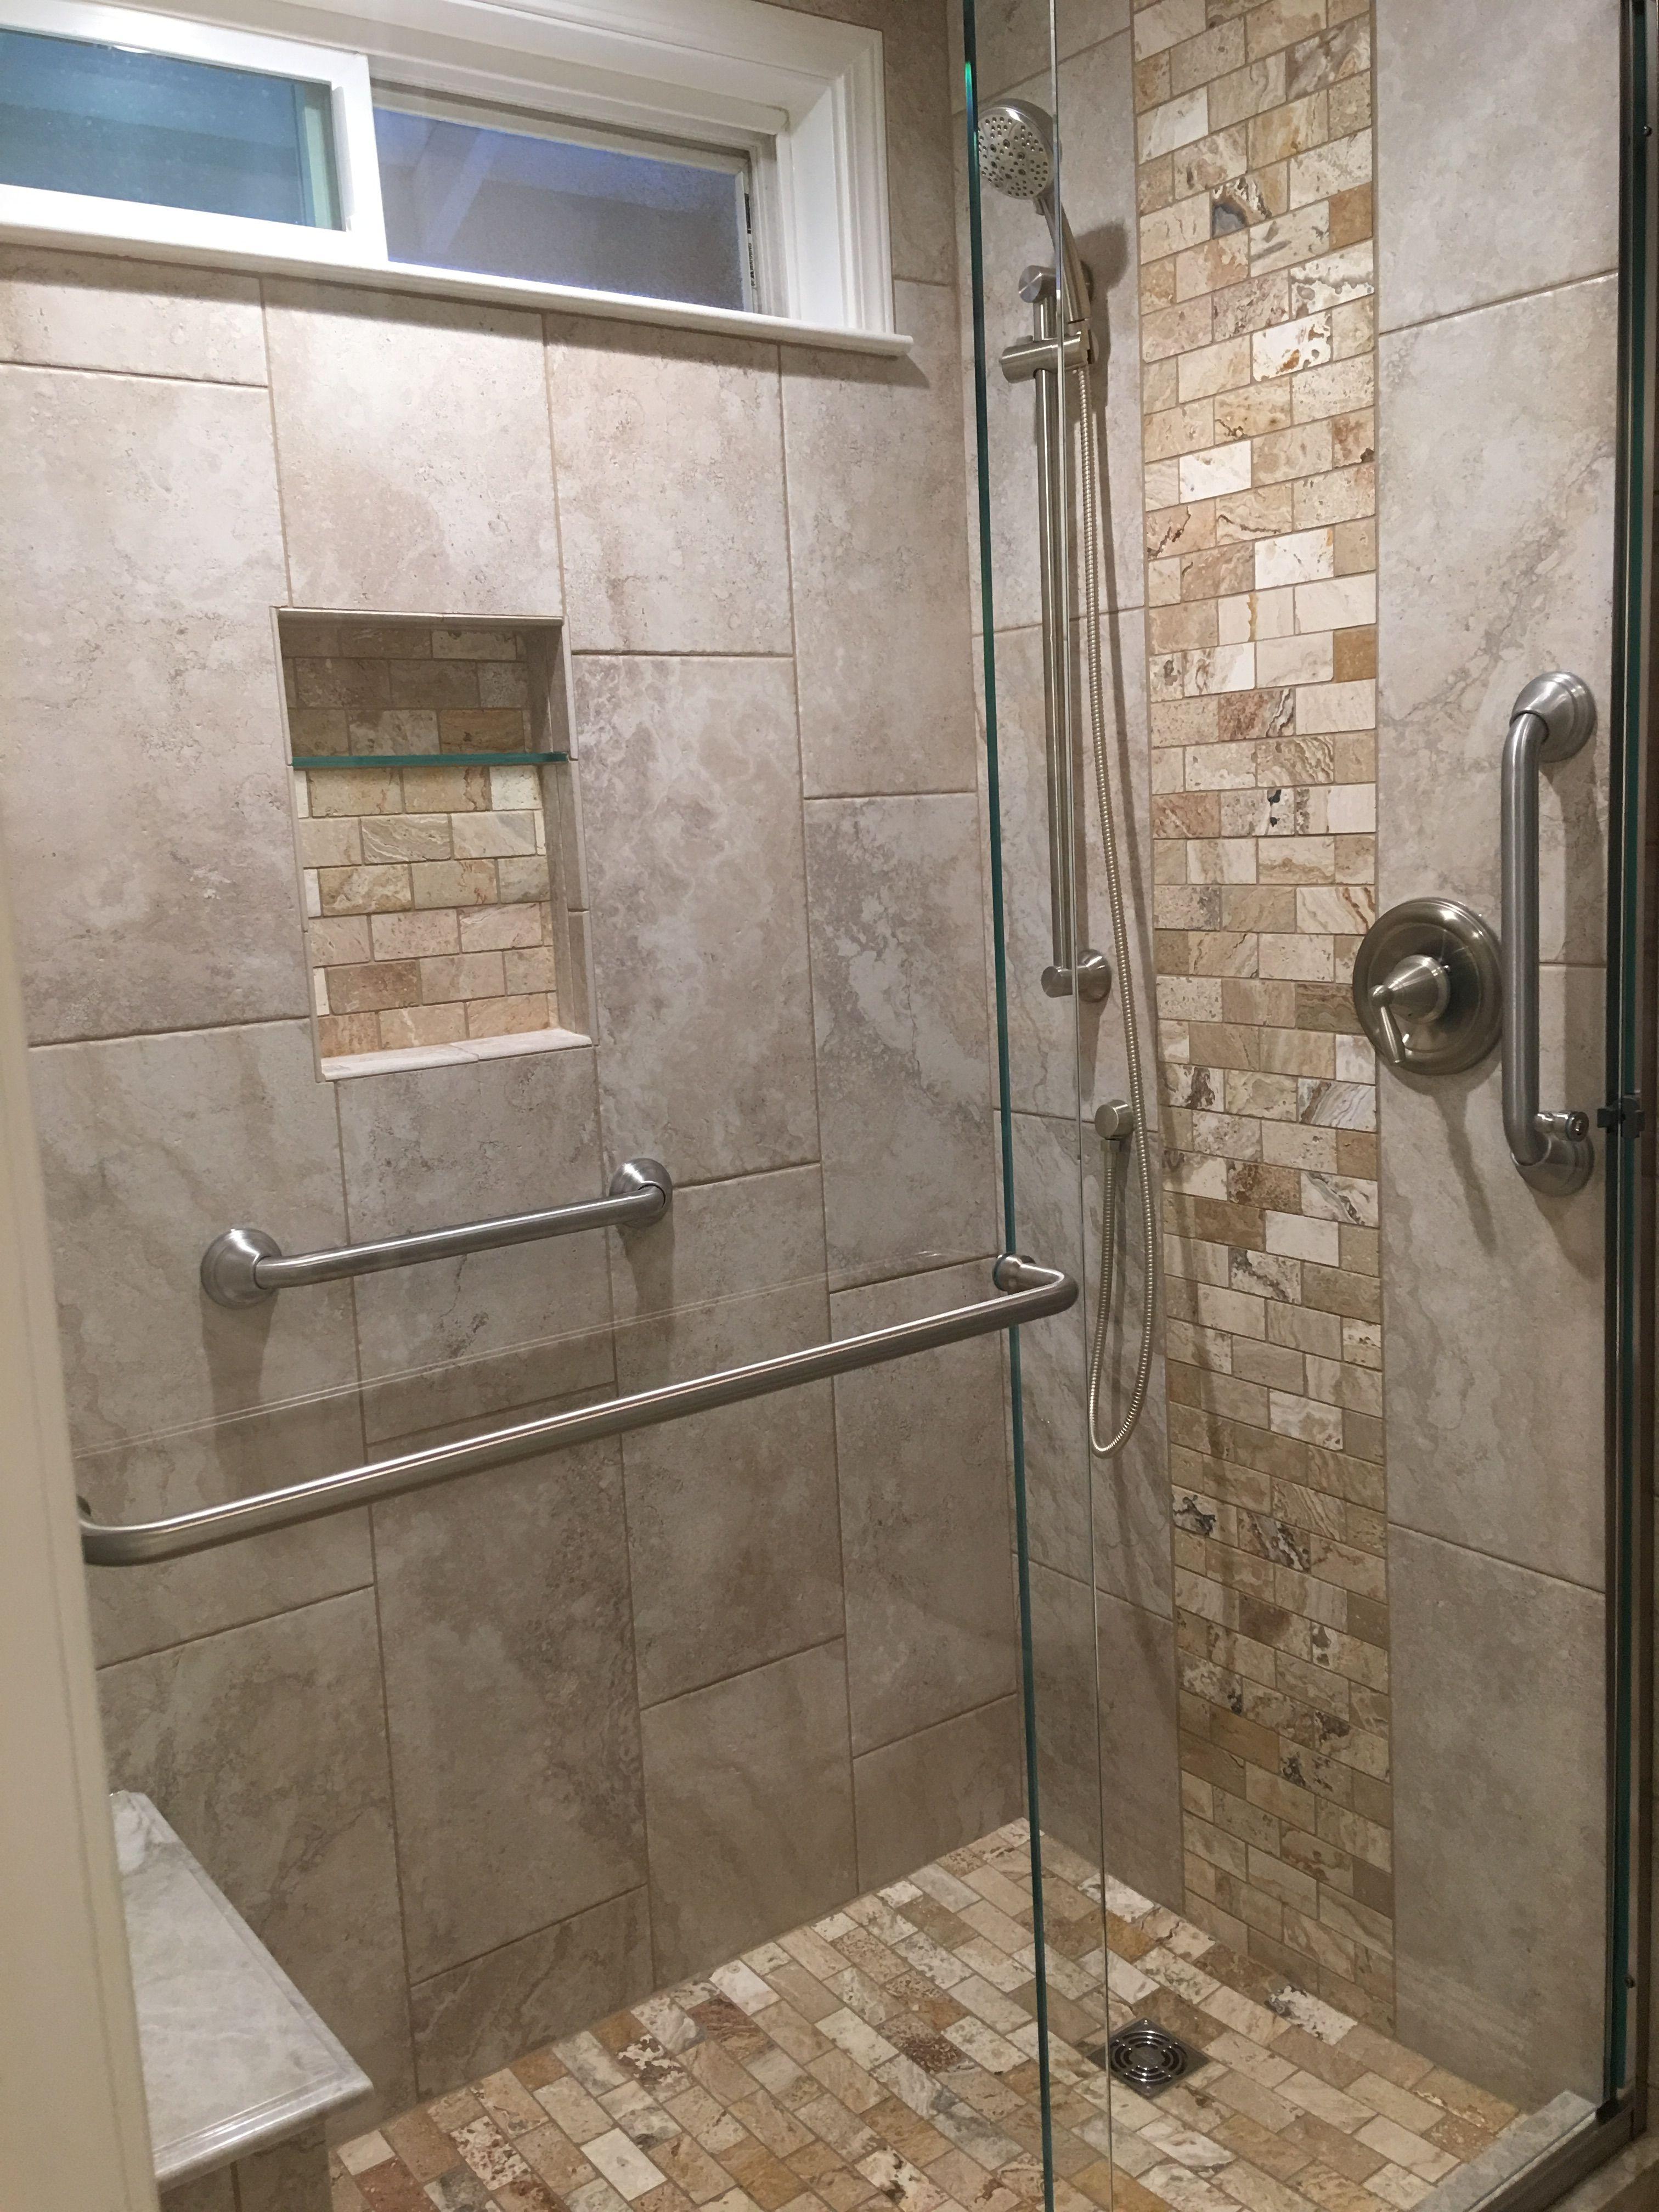 Bathroom Remodel Updated Bathroom New Shower Starfire Glass 83 Tall Shower Doors Lowes Tile Brushe Bathroom Remodel Master Bathrooms Remodel Shower Doors